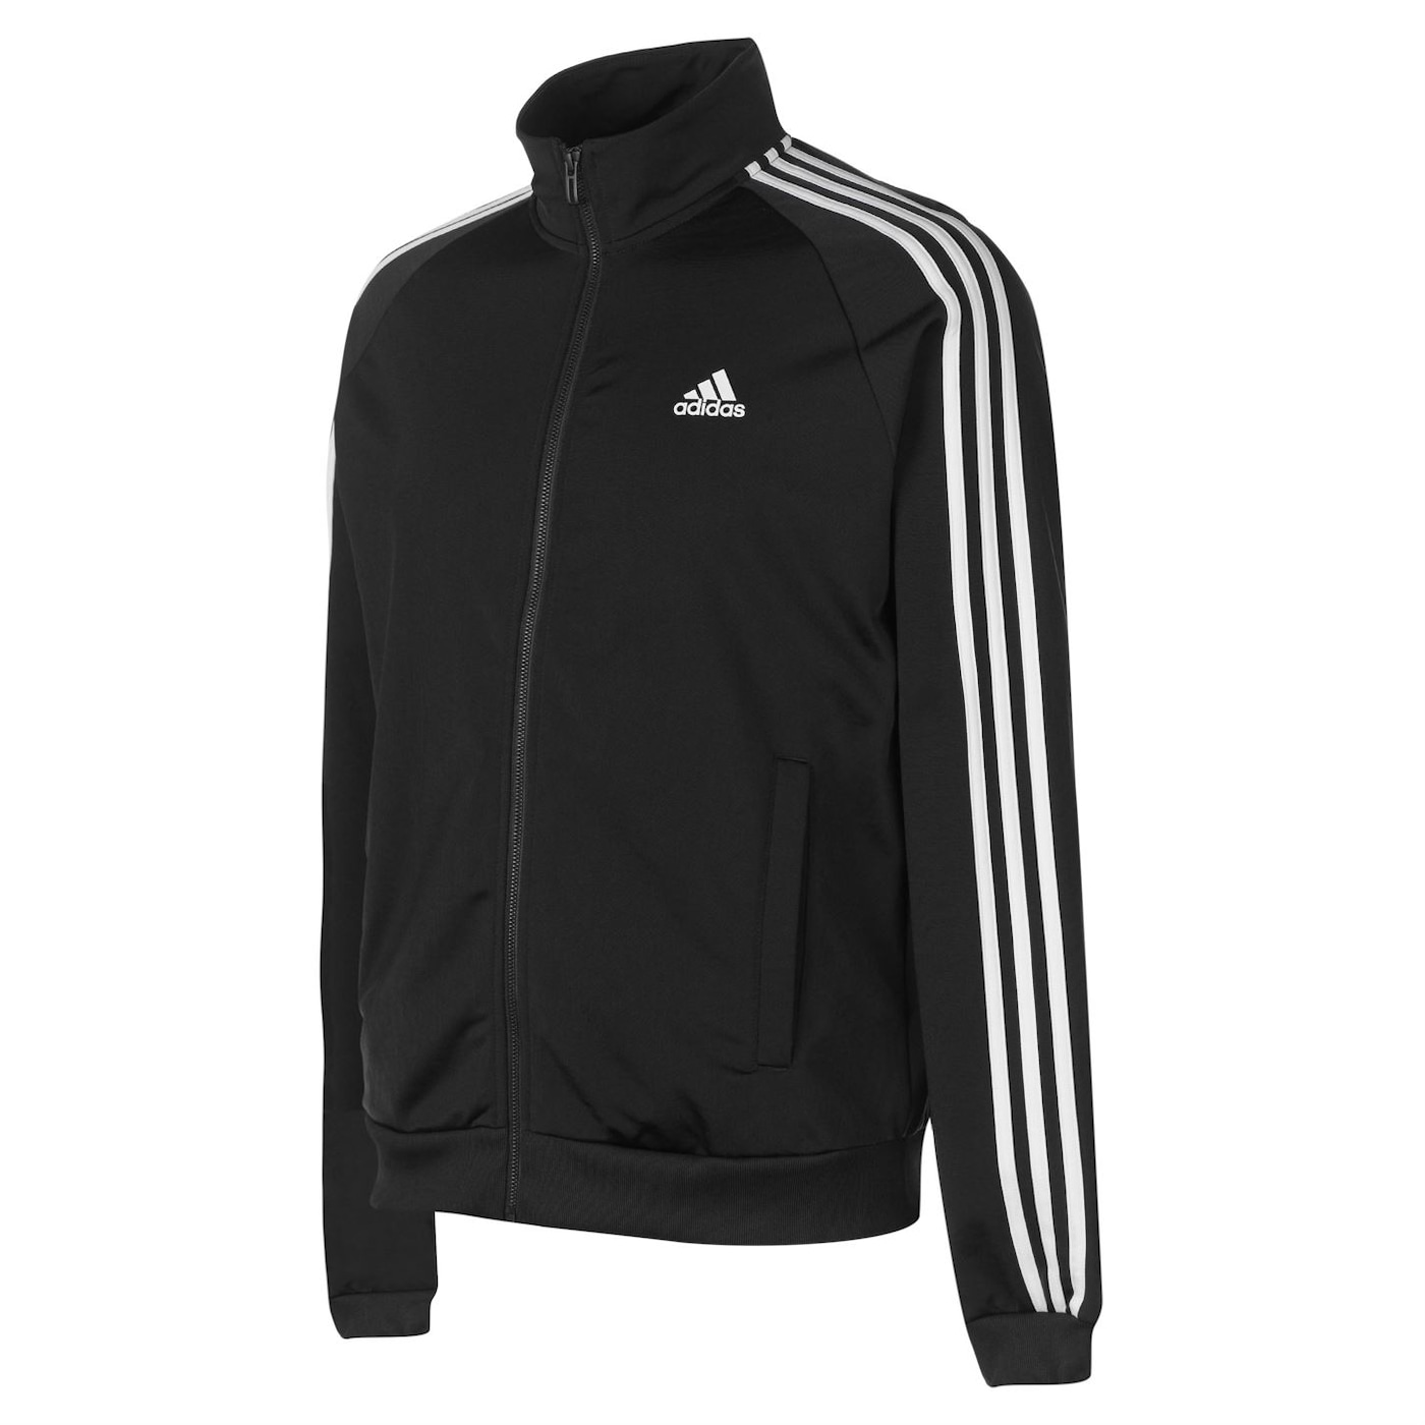 Adidas Essential 3S Track Top Mens